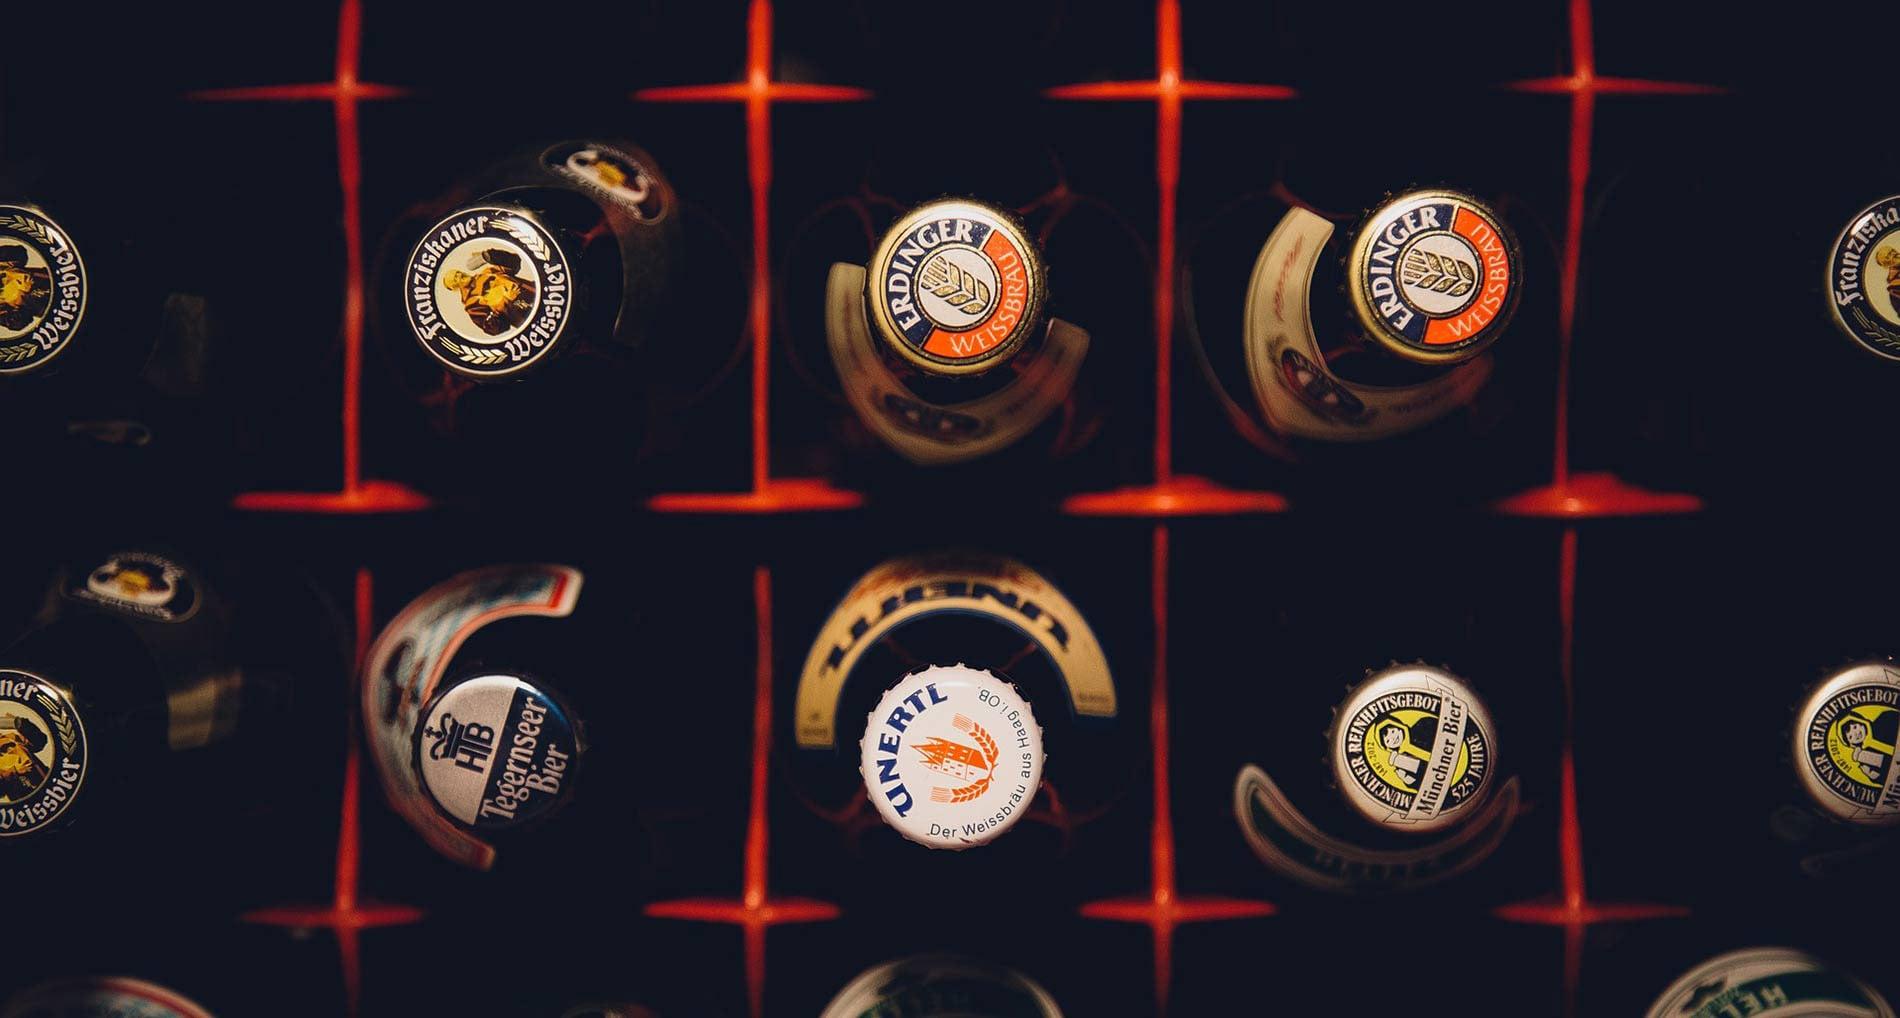 Así debe ser la cerveza perfecta